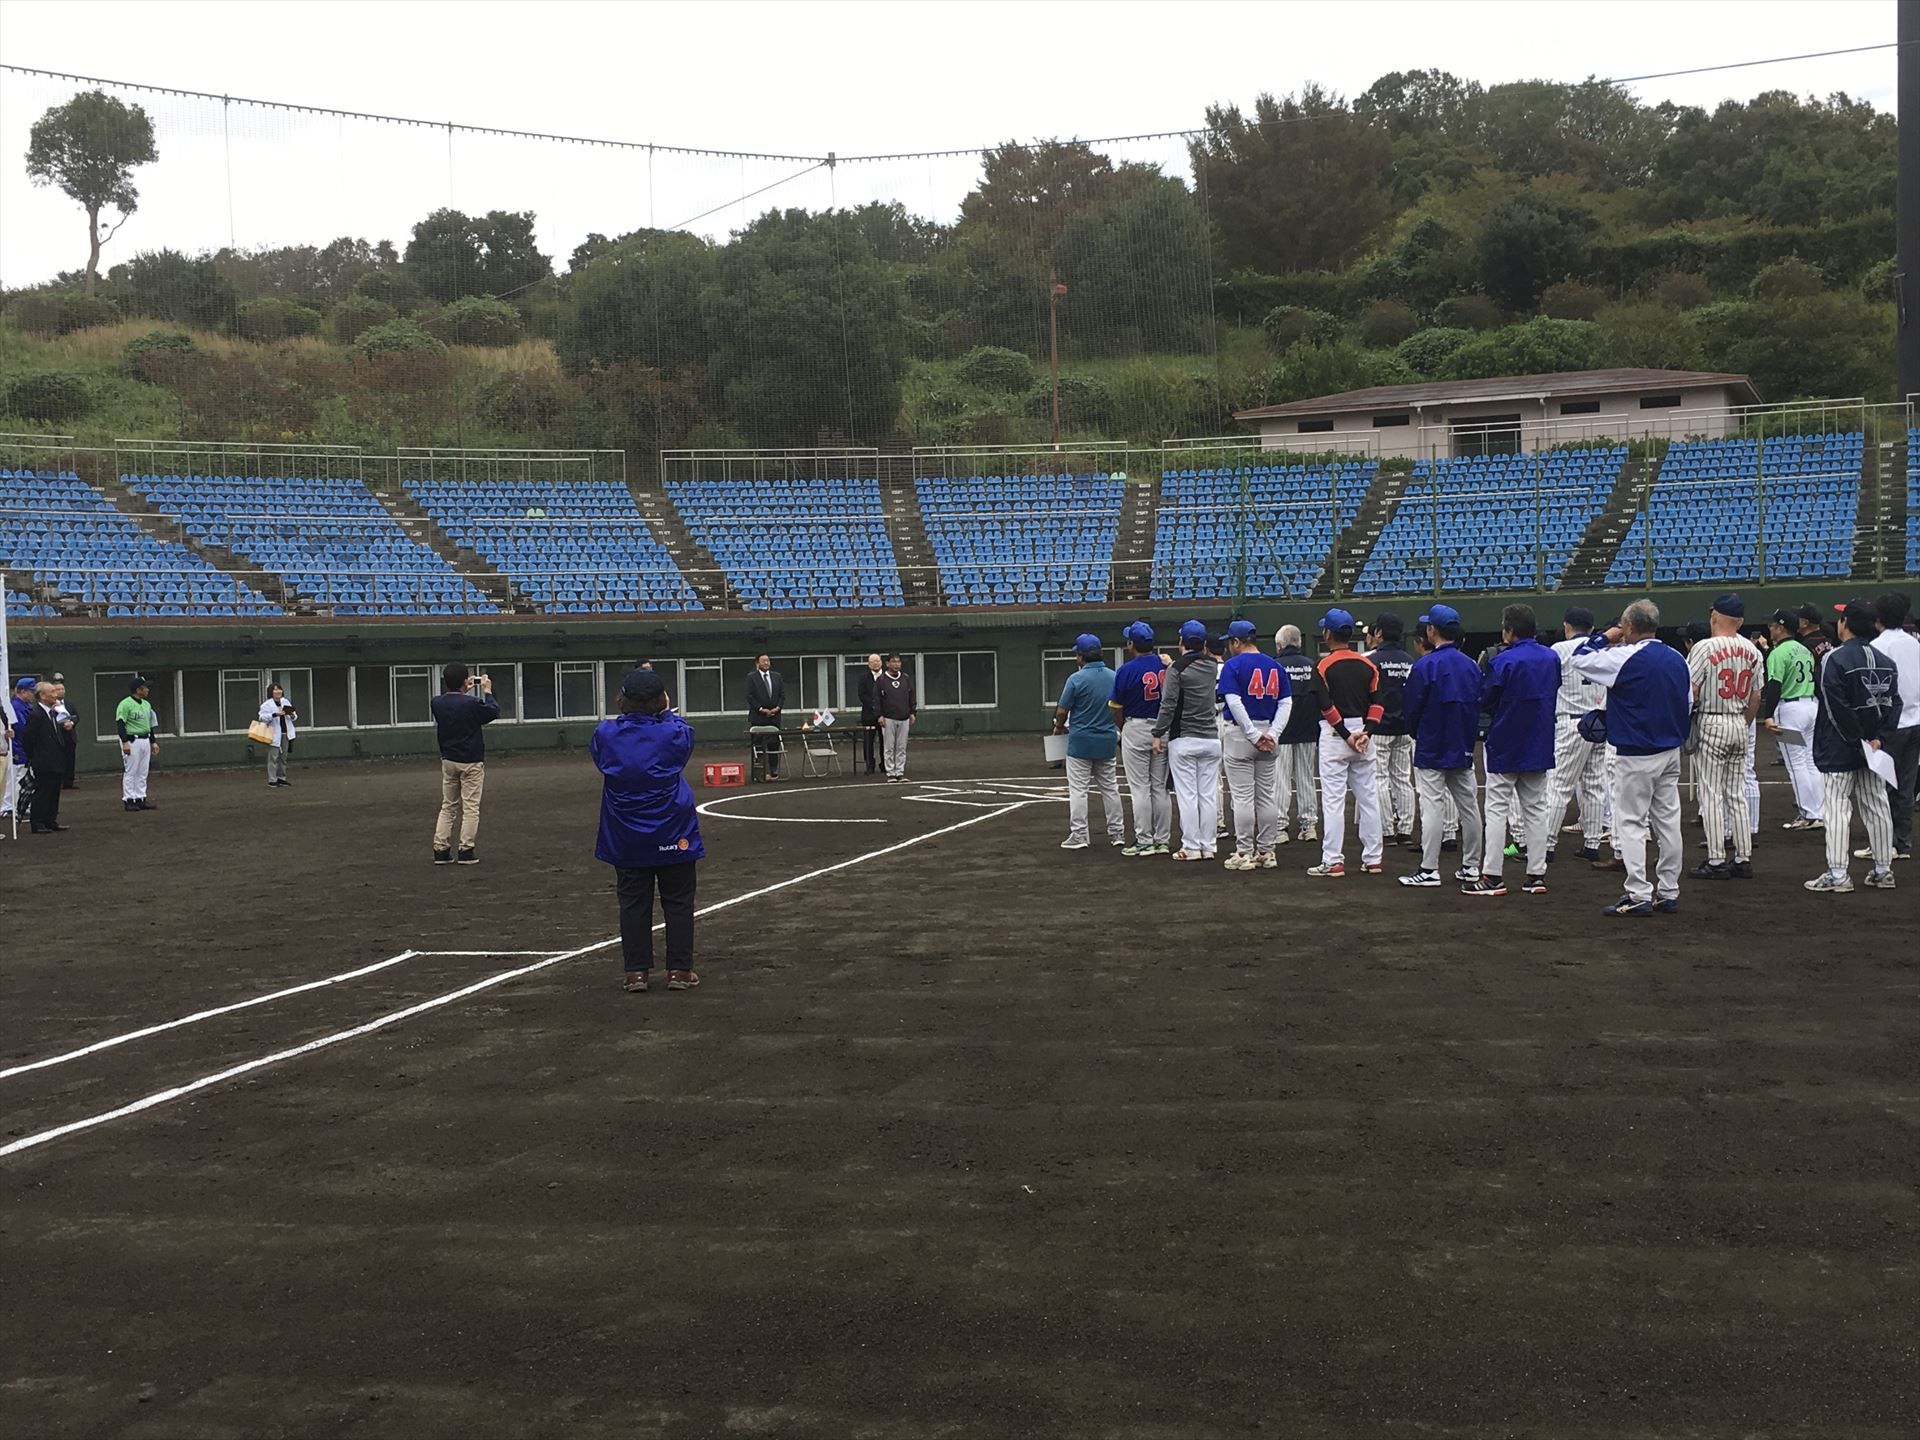 20181012_baseball_010